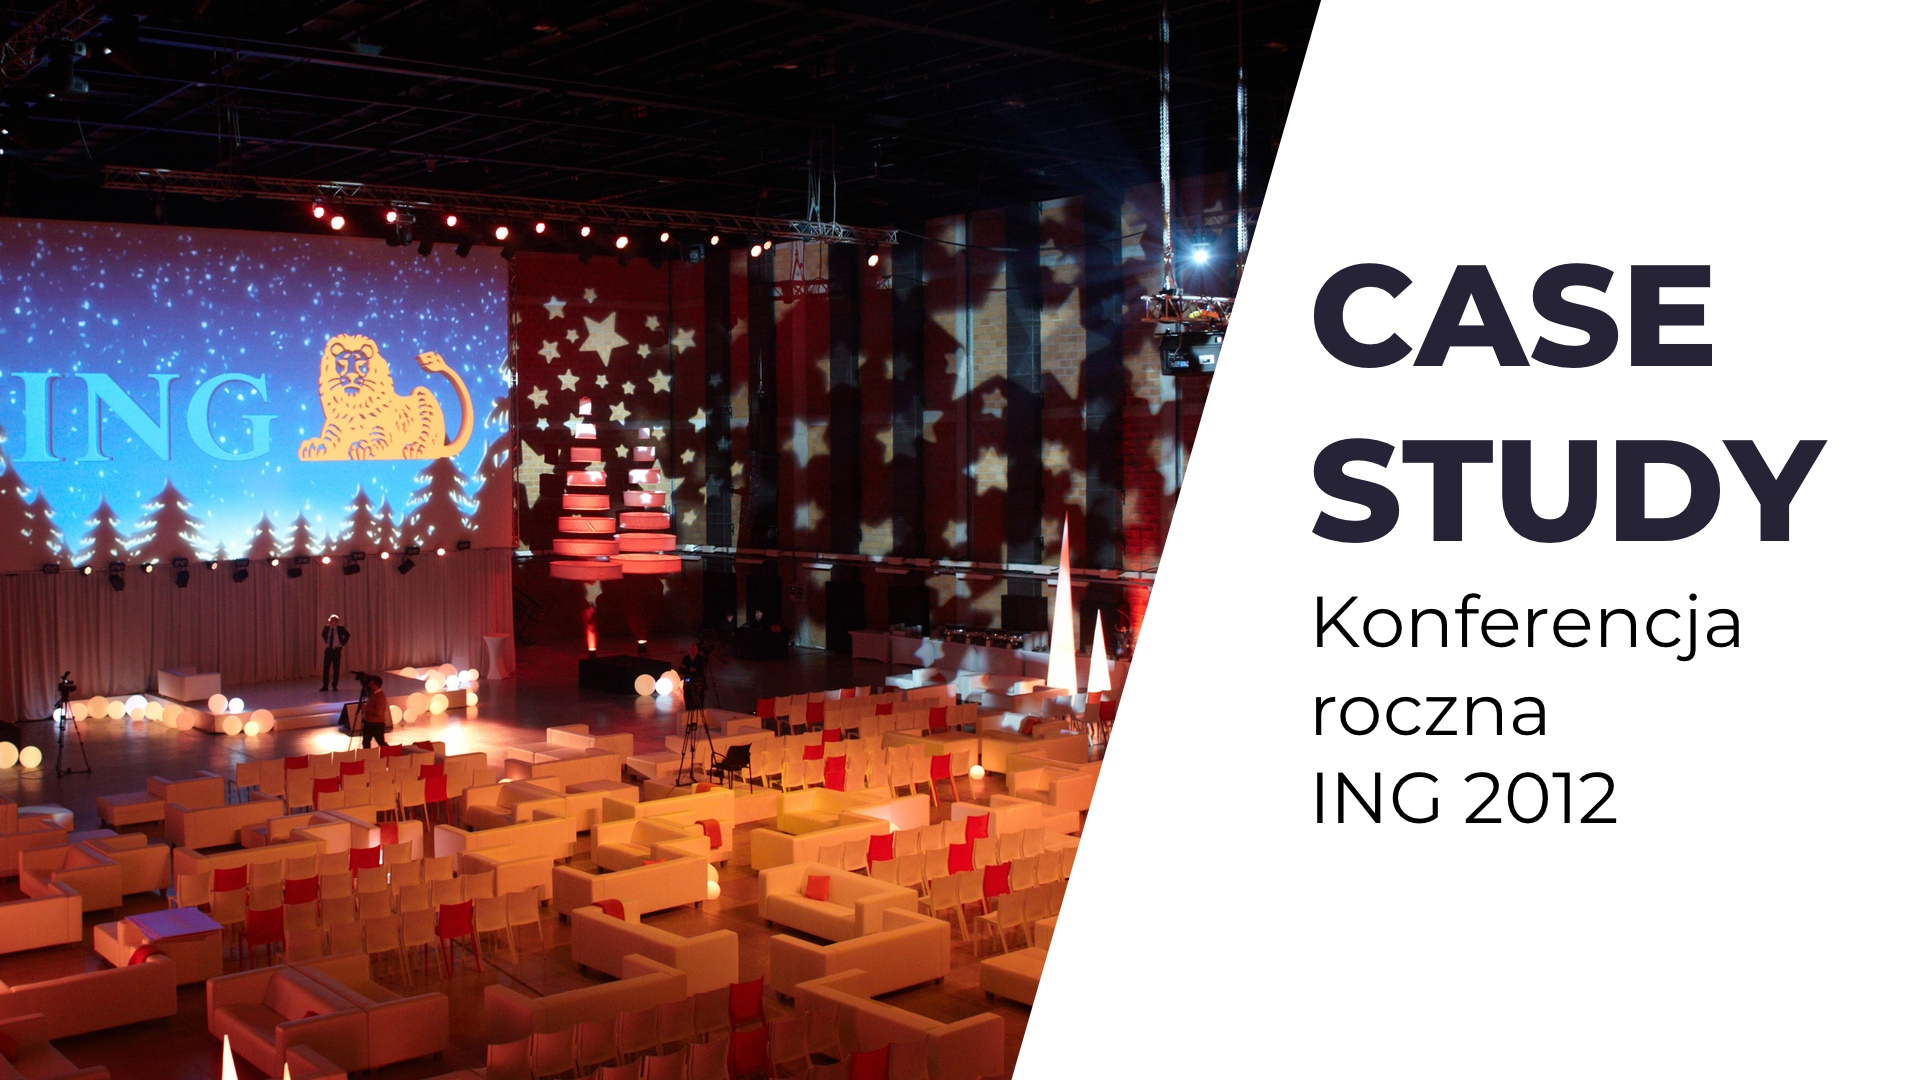 Case Study: ING Konferencja roczna 2012